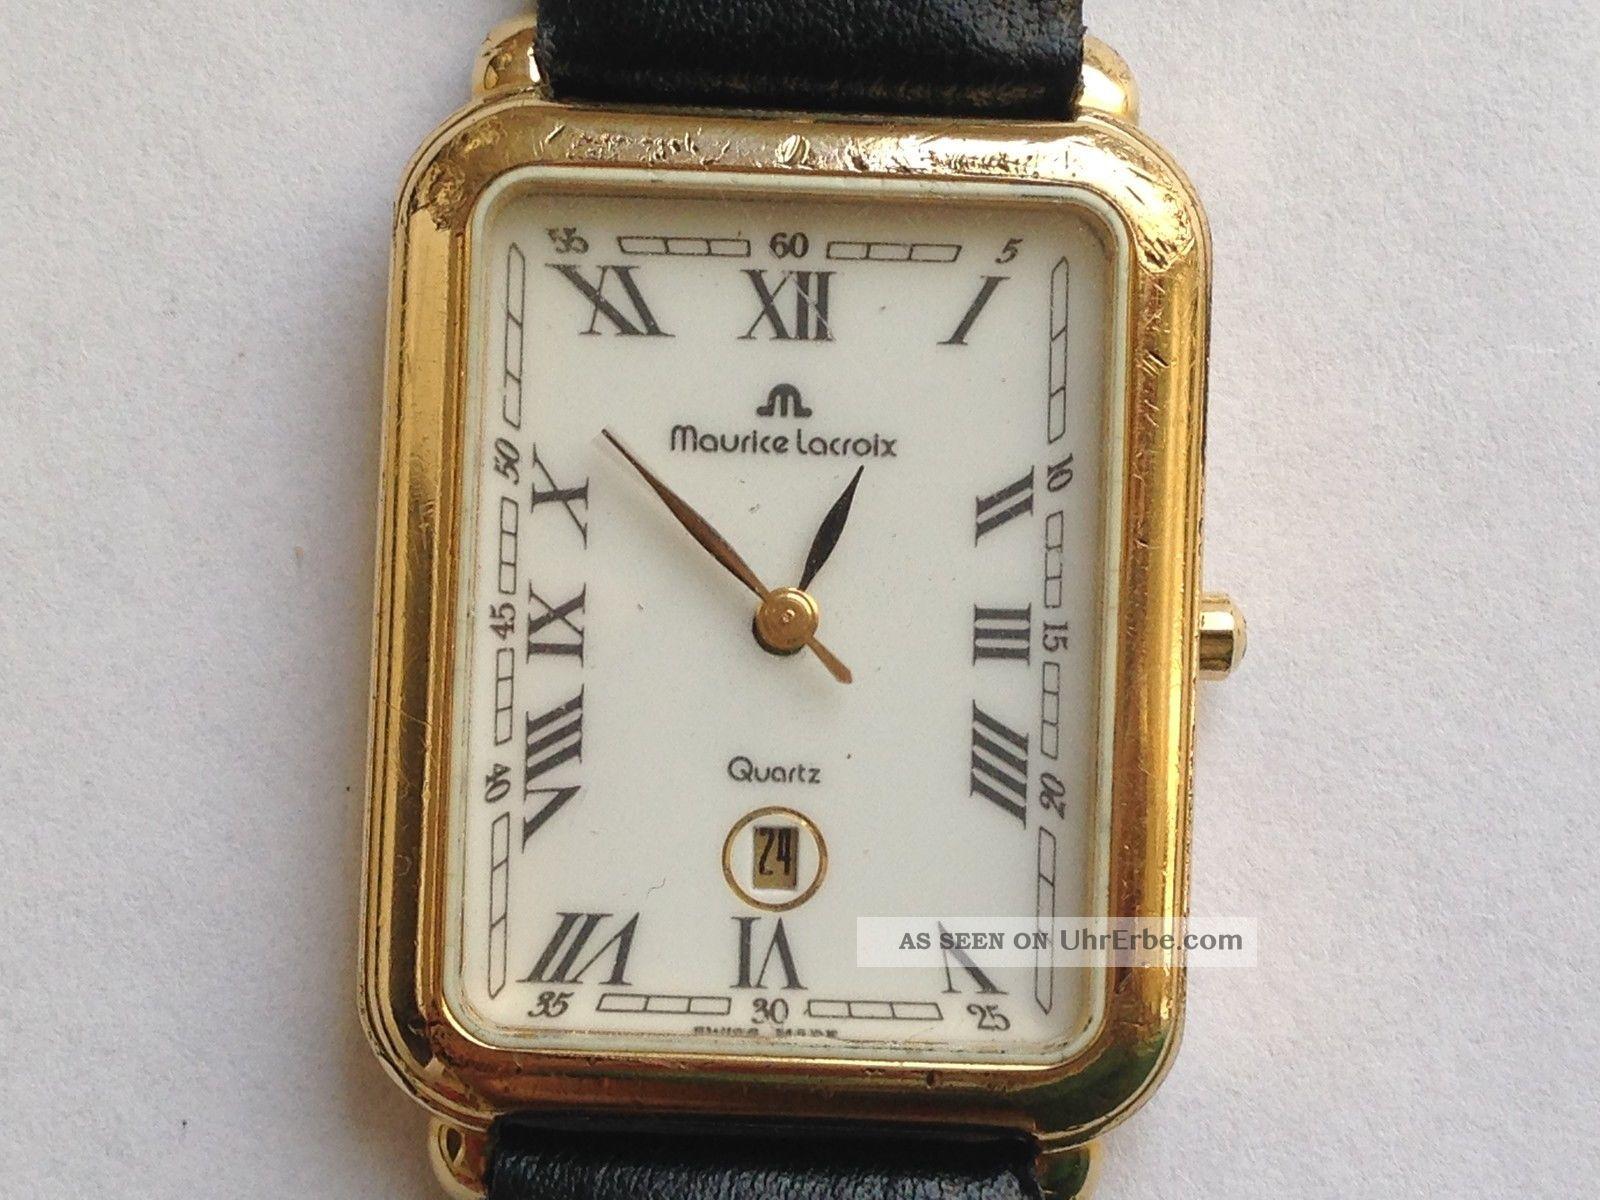 Schöne Orig.  Maurice Lacroix Quartz Uhr Armbanduhr. Armbanduhren Bild